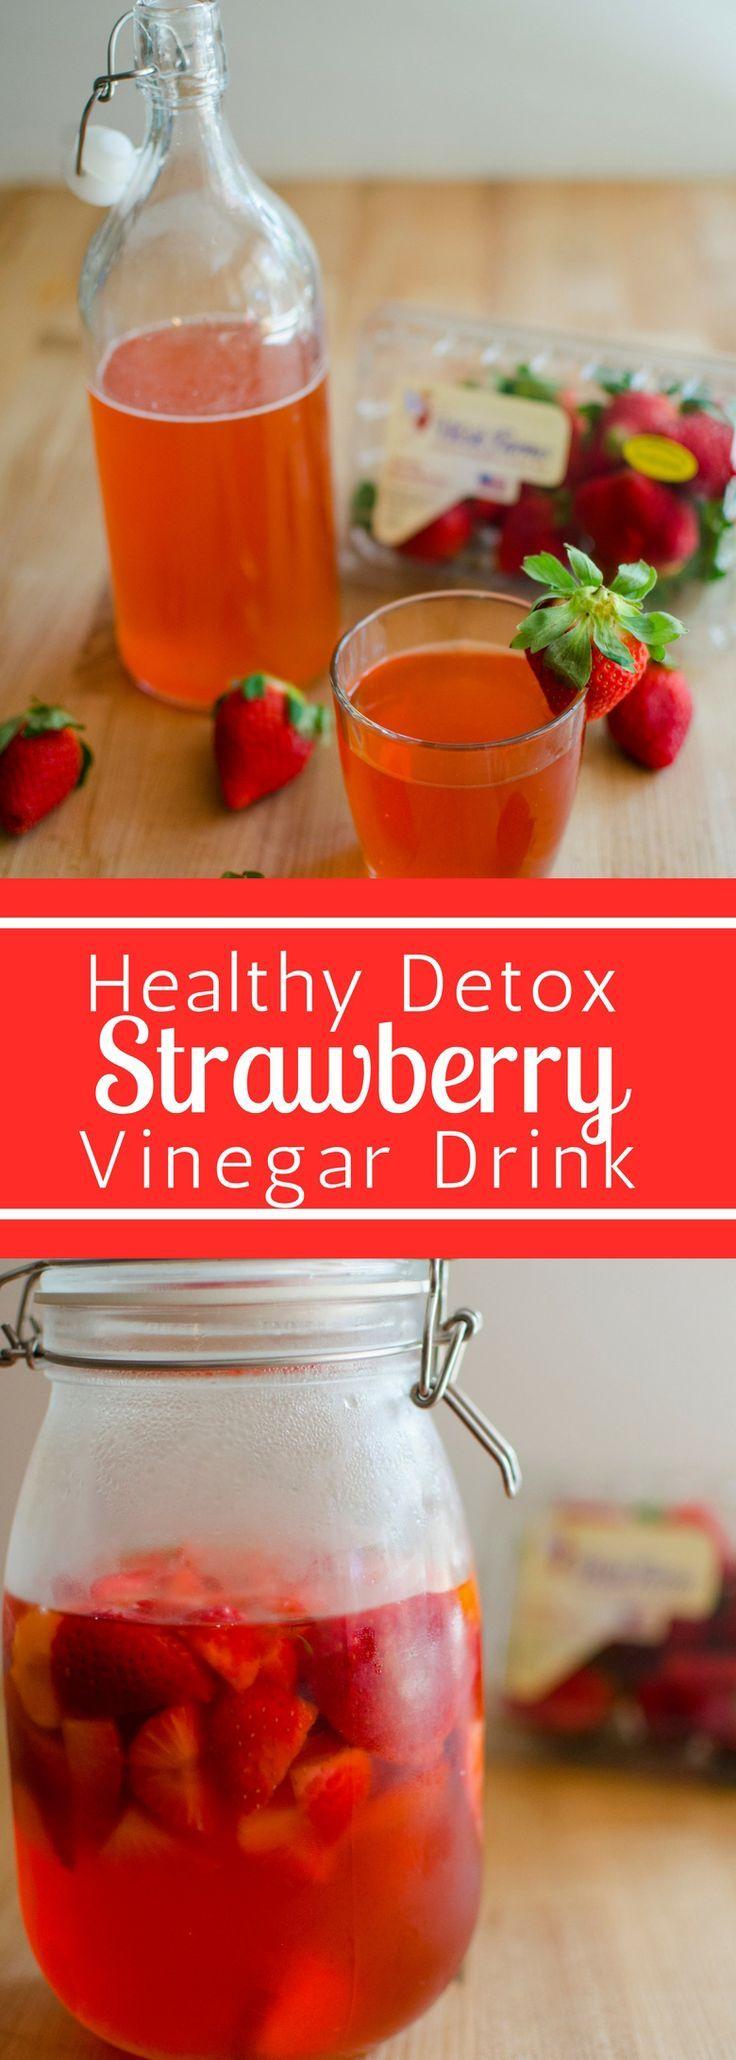 Flstrawberry Detox Vinegar Drink Sundaysupper If You Haven T Hopped On The Vinegar Drink Bandwagon Now Is Vinegar Drinks Healthy Detox Healthy Detox Cleanse